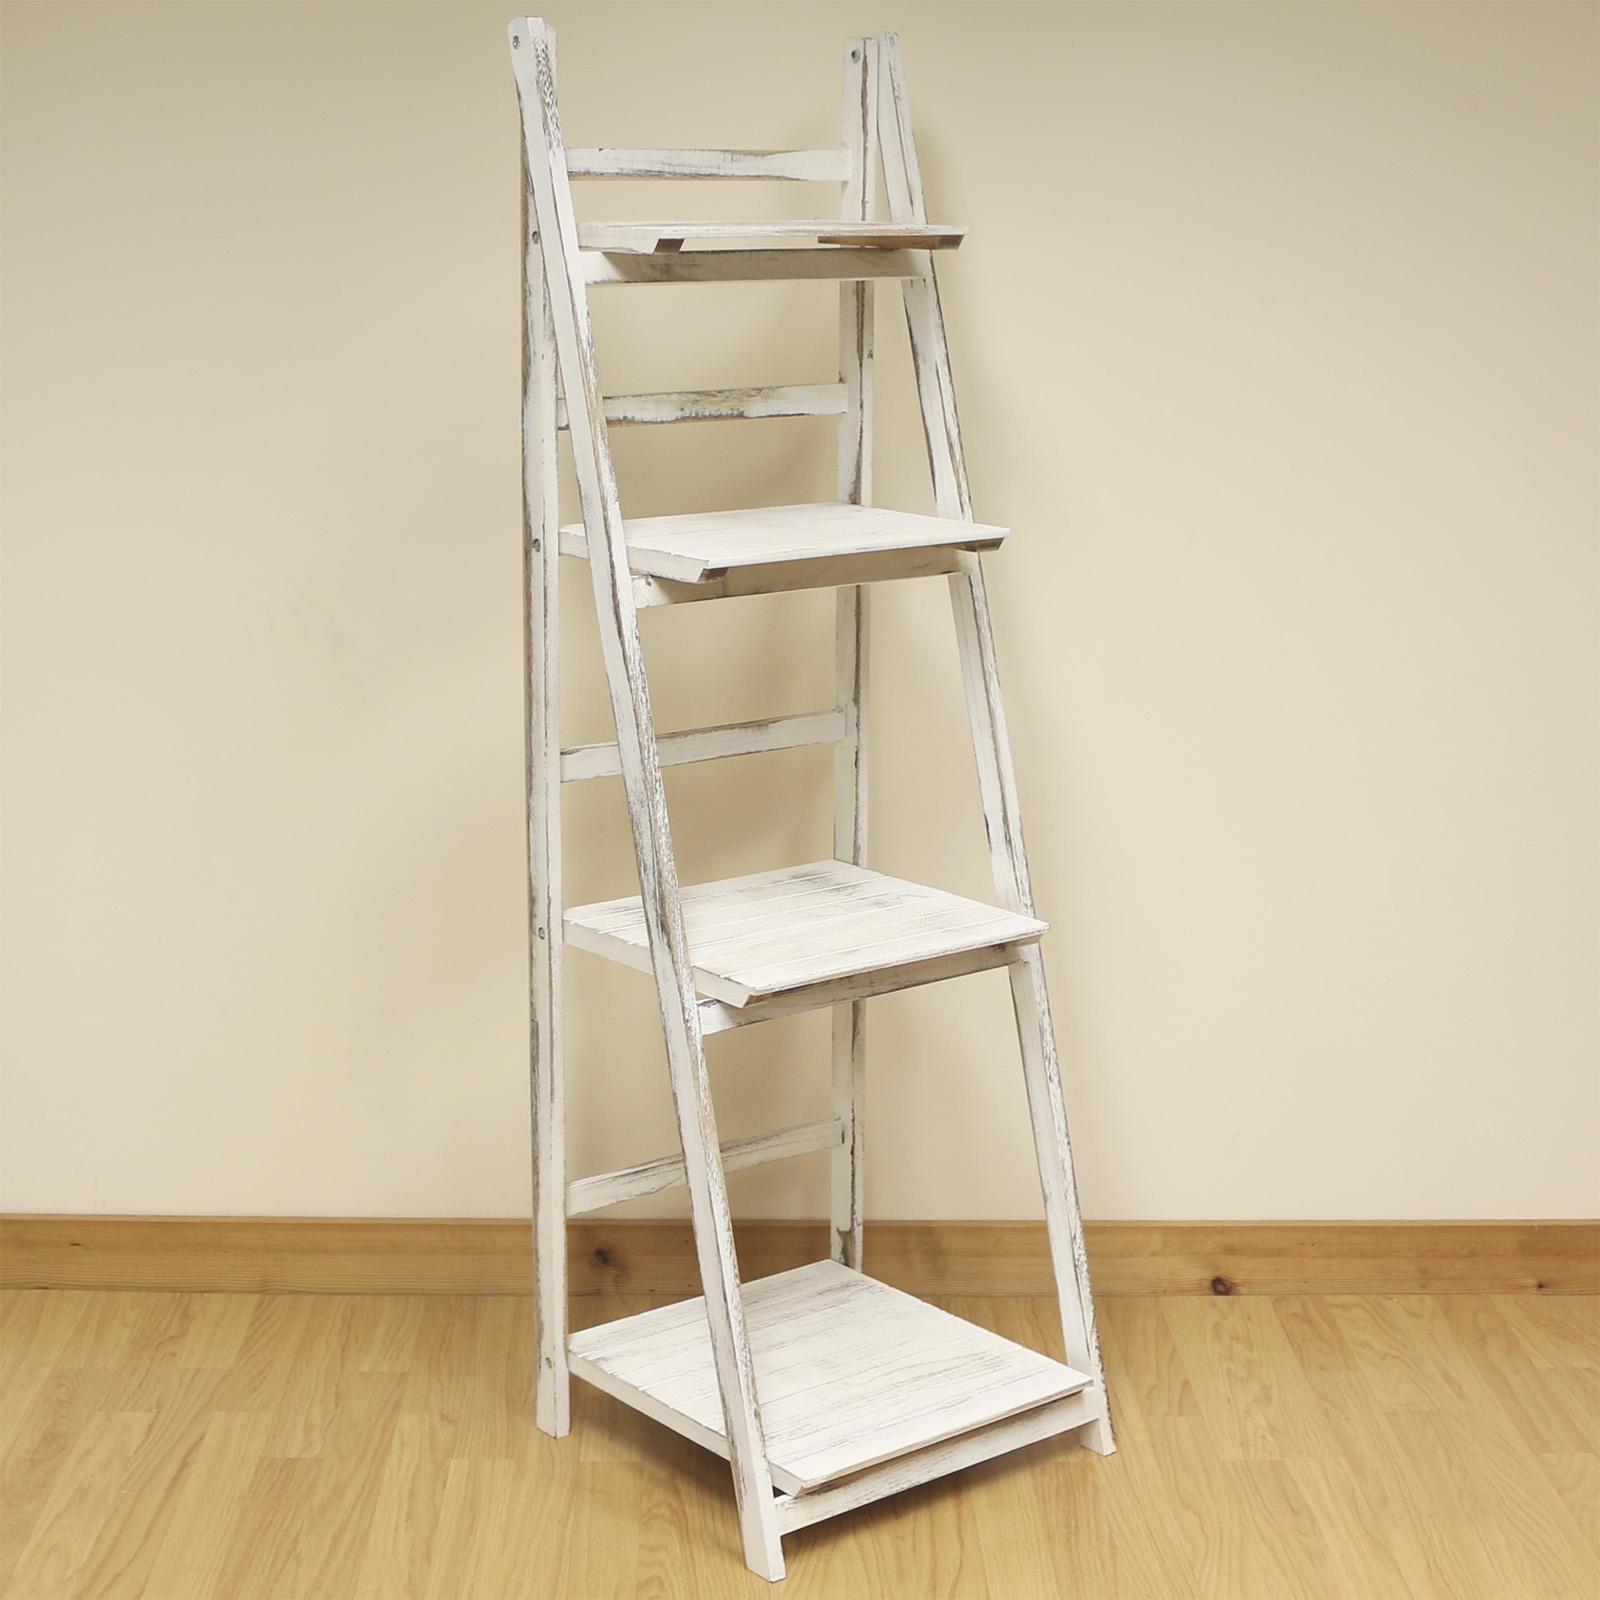 4 Tier White Wash Ladder Shelf Display Unit Free Standing